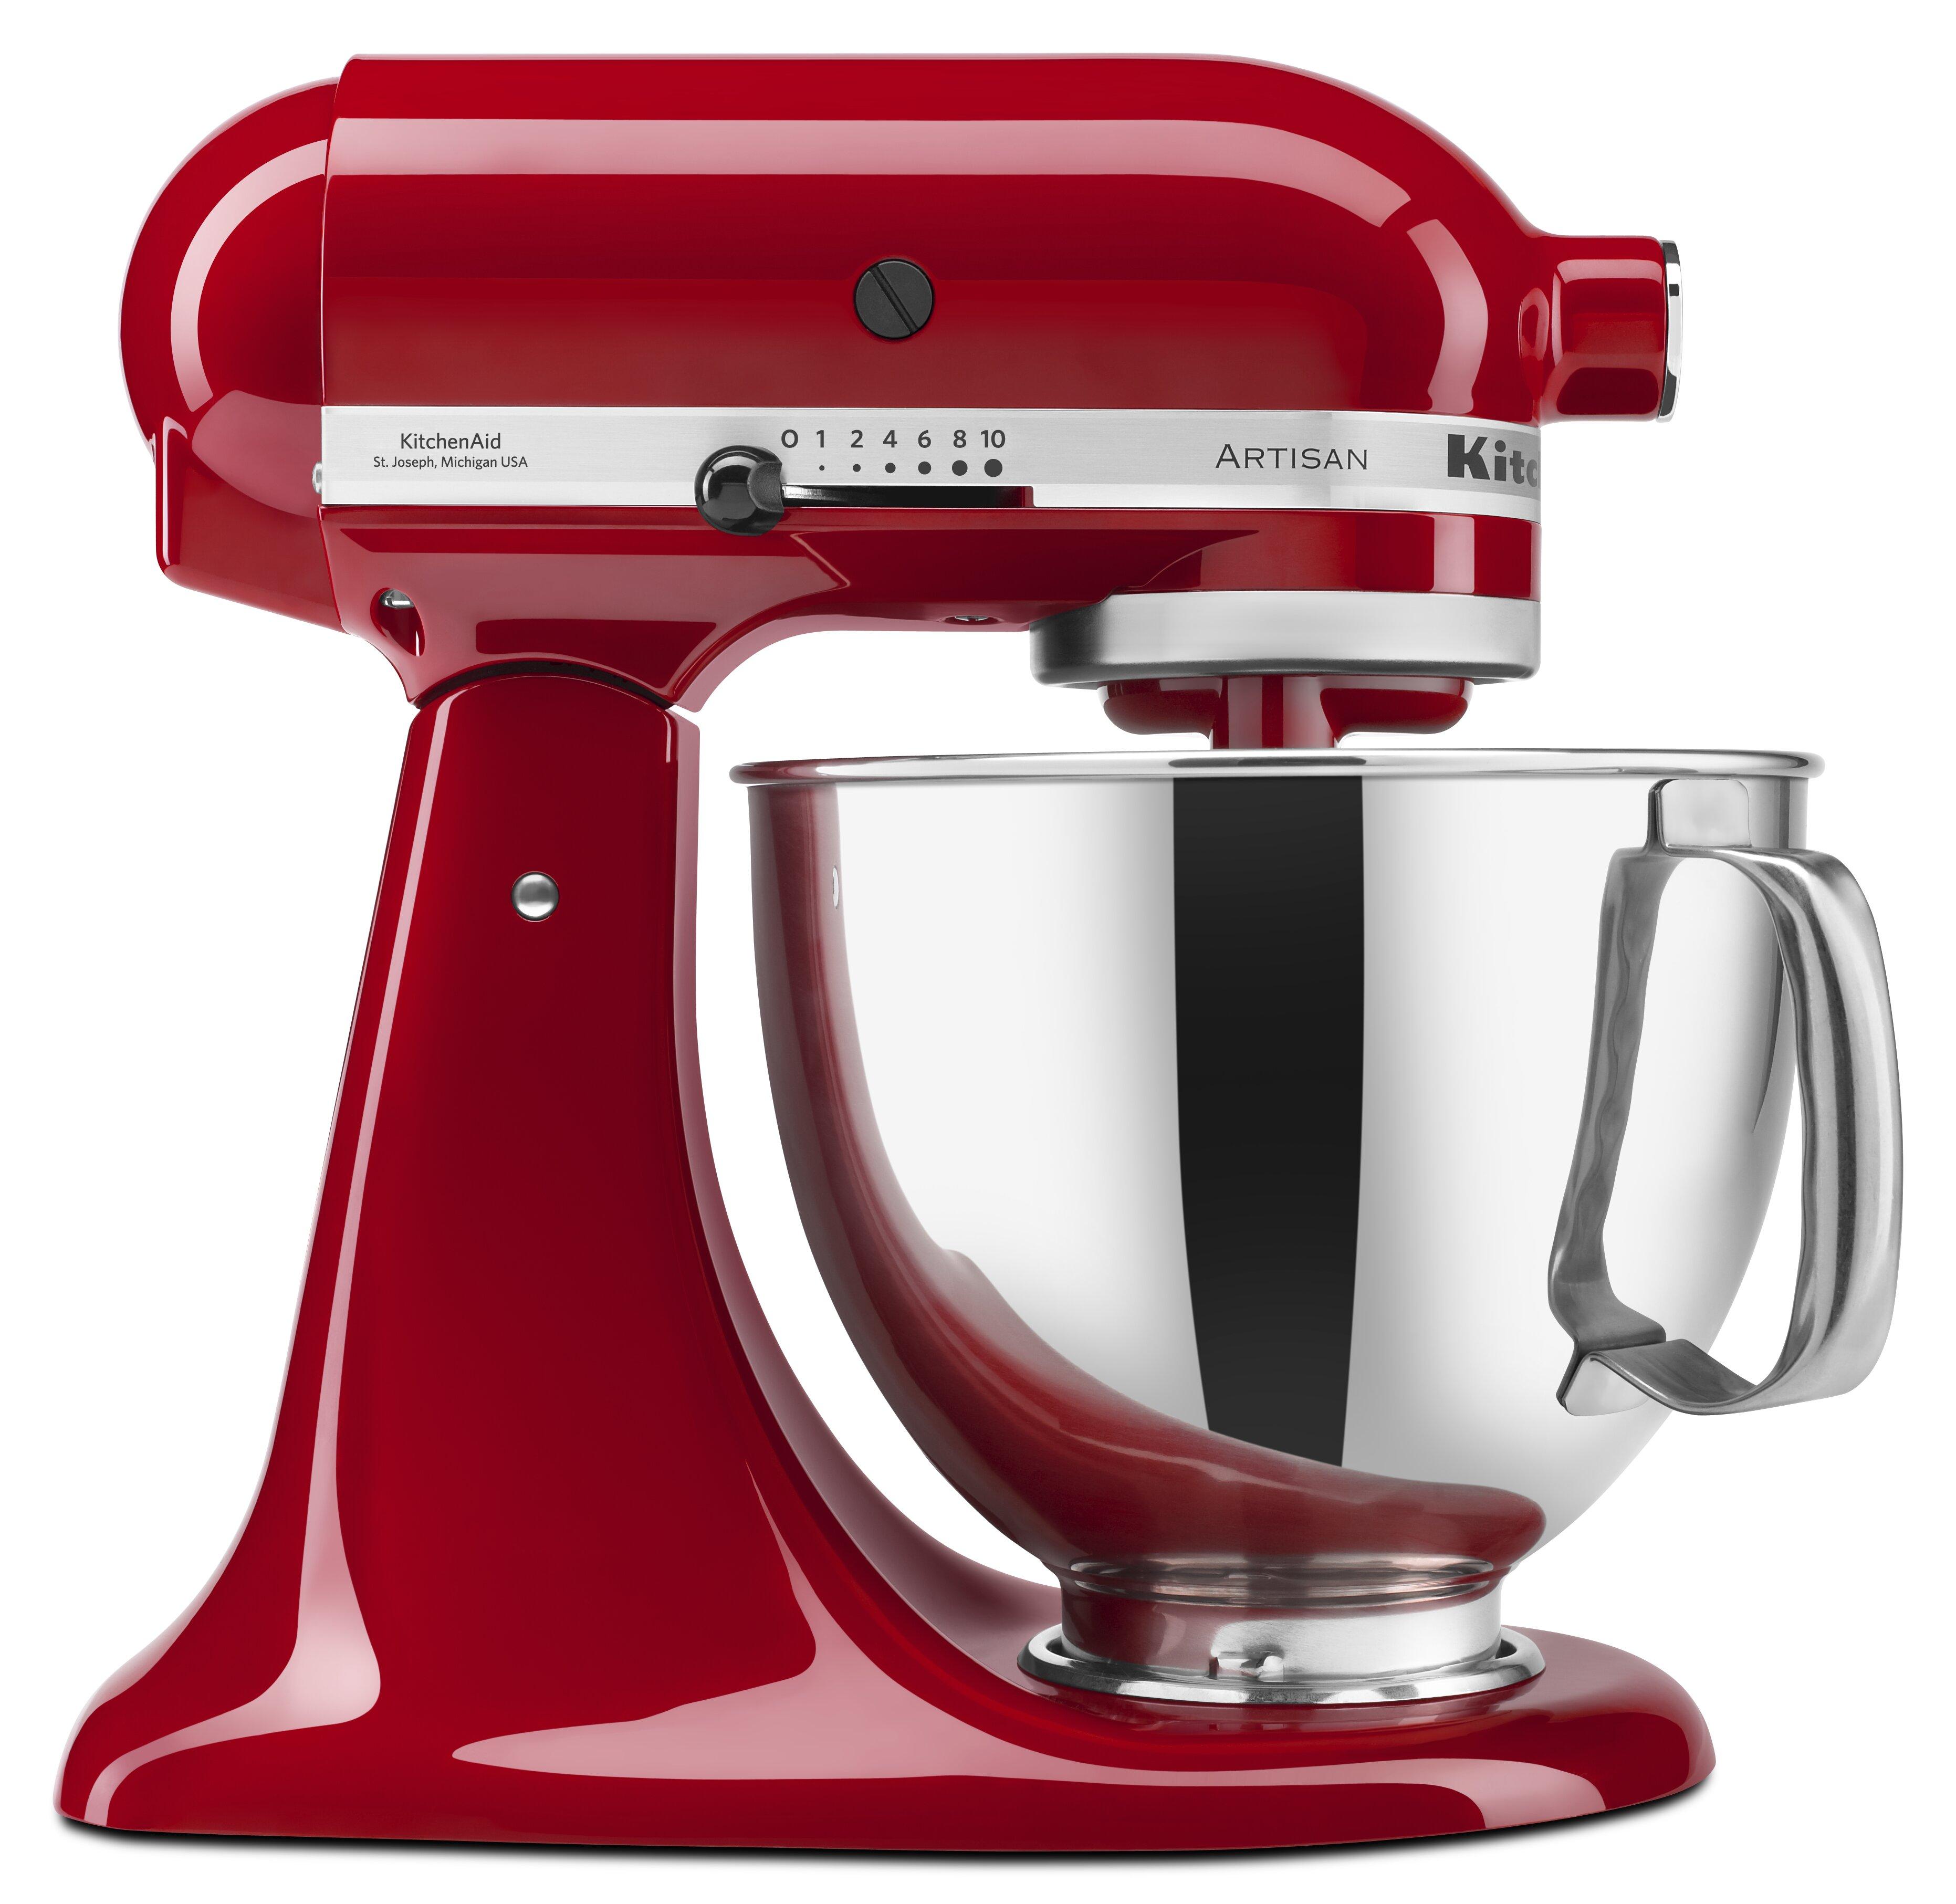 Kitchenaid 10 Sd 5 Qt Stand Mixer Ksm150 Reviews Wayfair